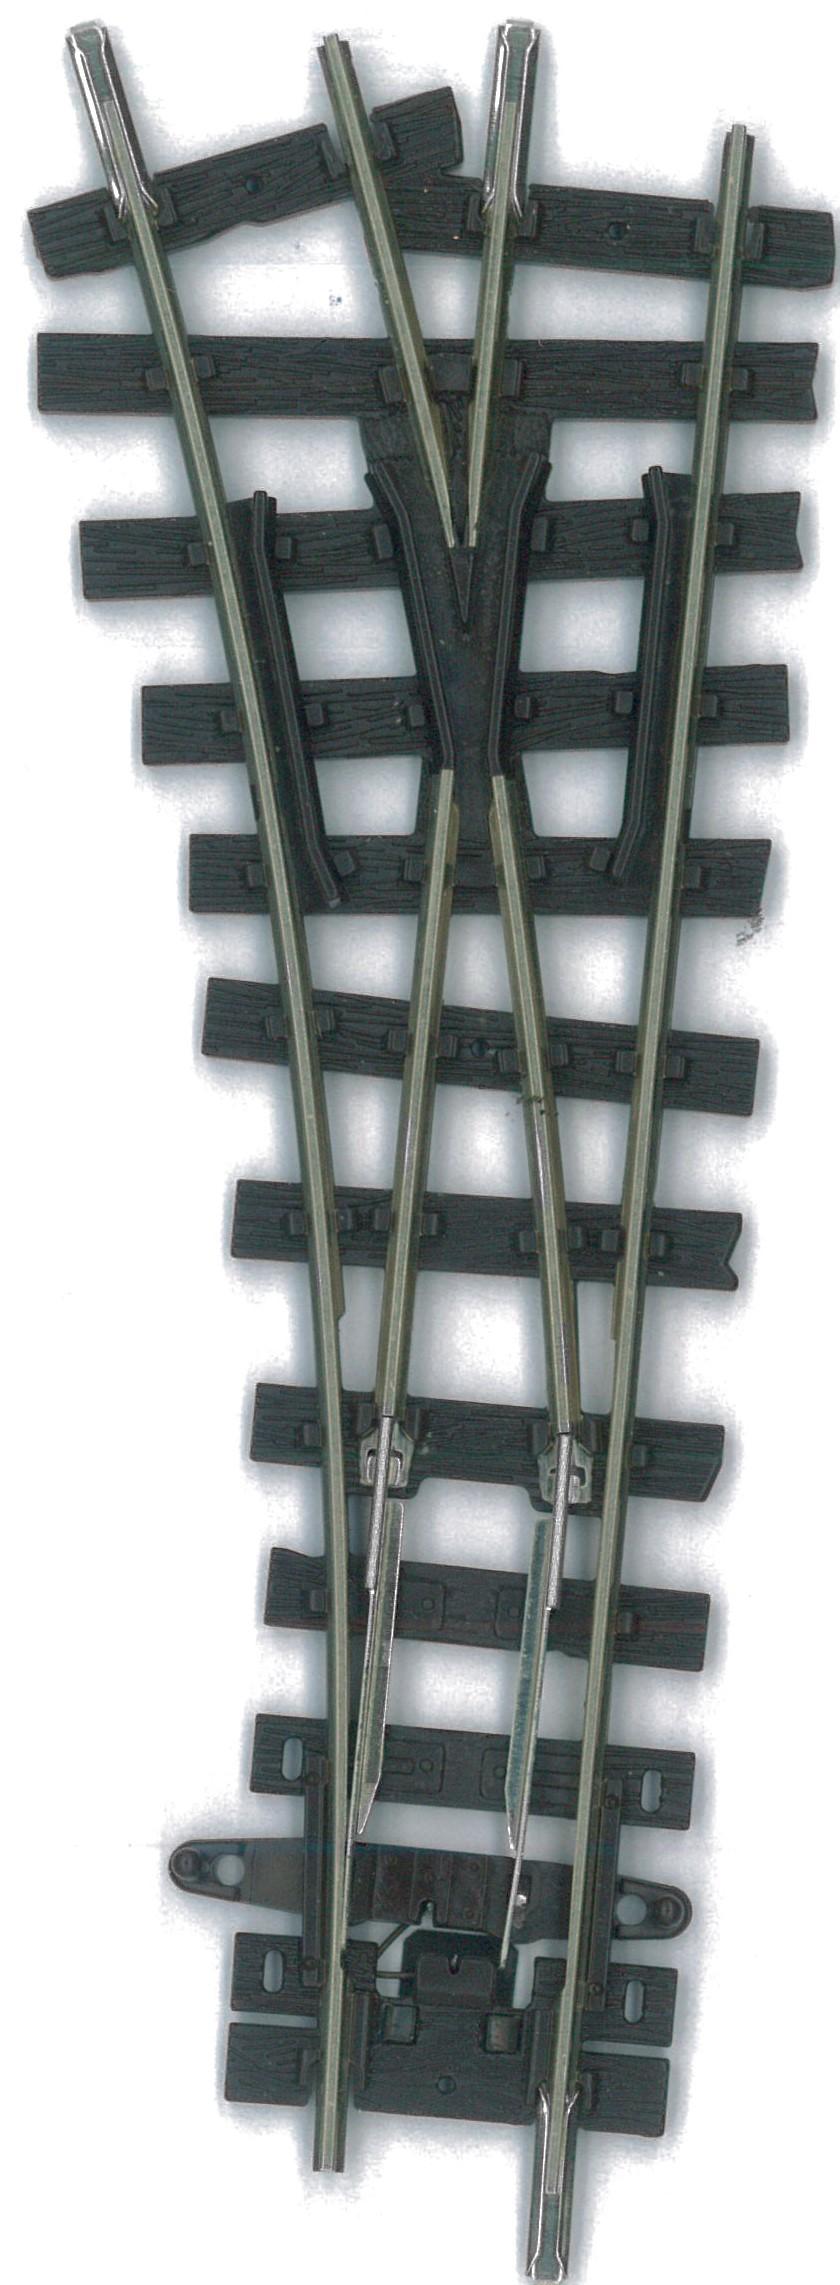 H0e Weiche kurz links, R=228mm - Peco  | günstig bestellen bei Modelleisenbahn Center  MCS Vertriebs GmbH